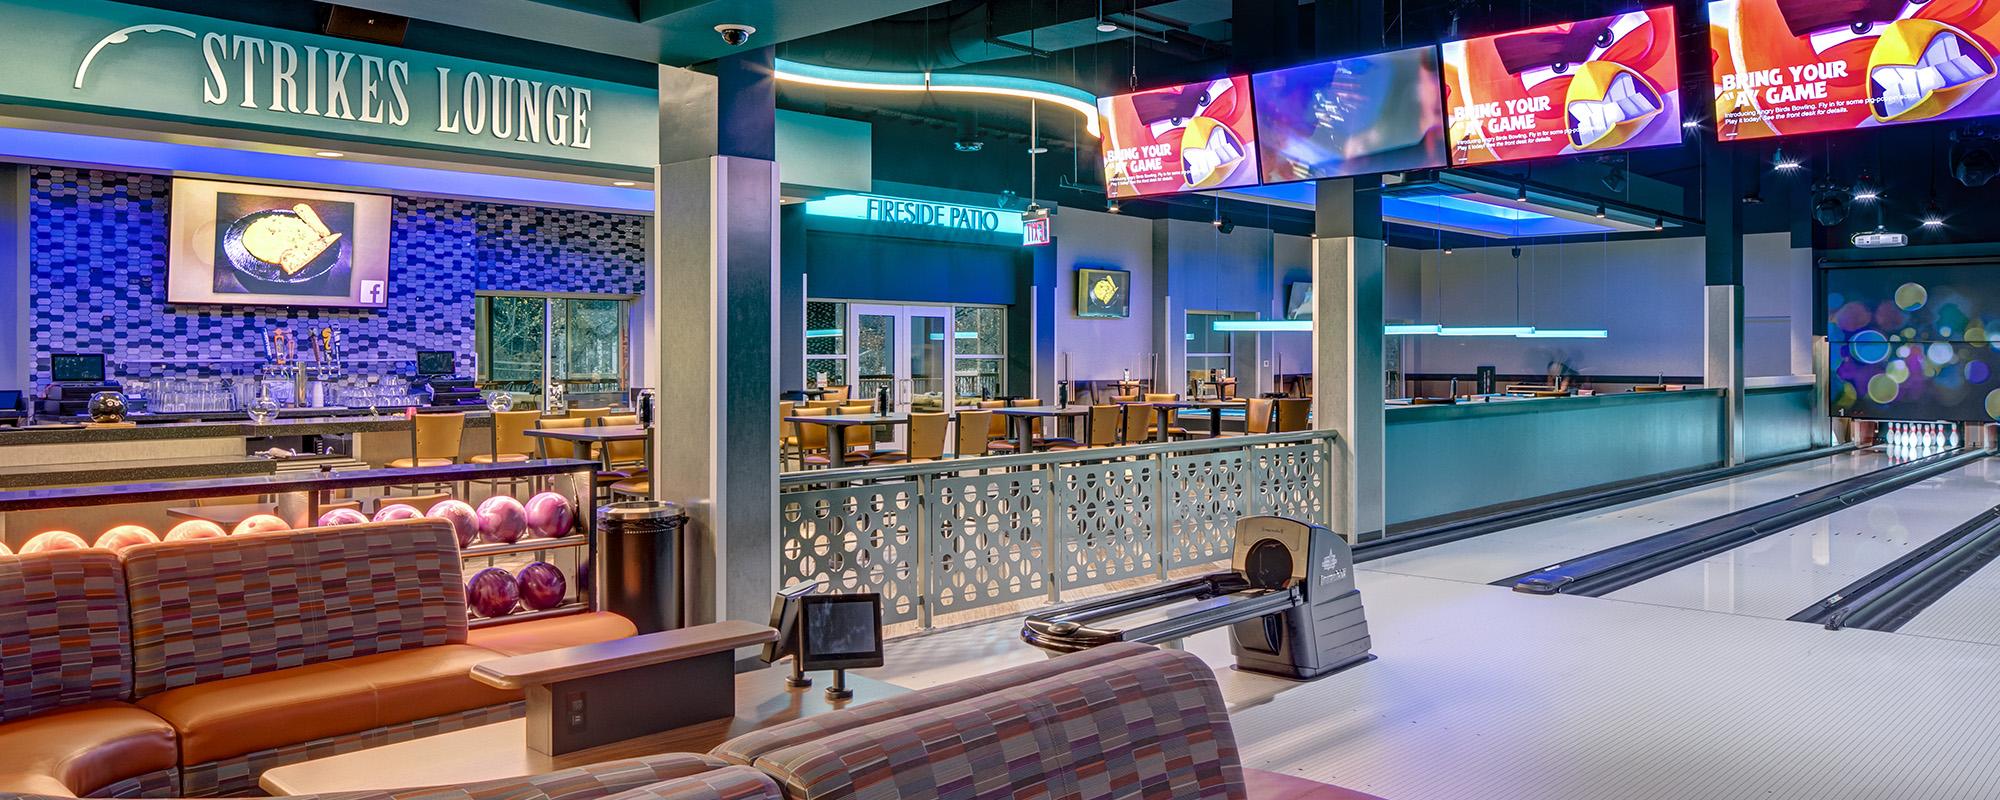 UltraStar Strikes Lounge and Second Floor